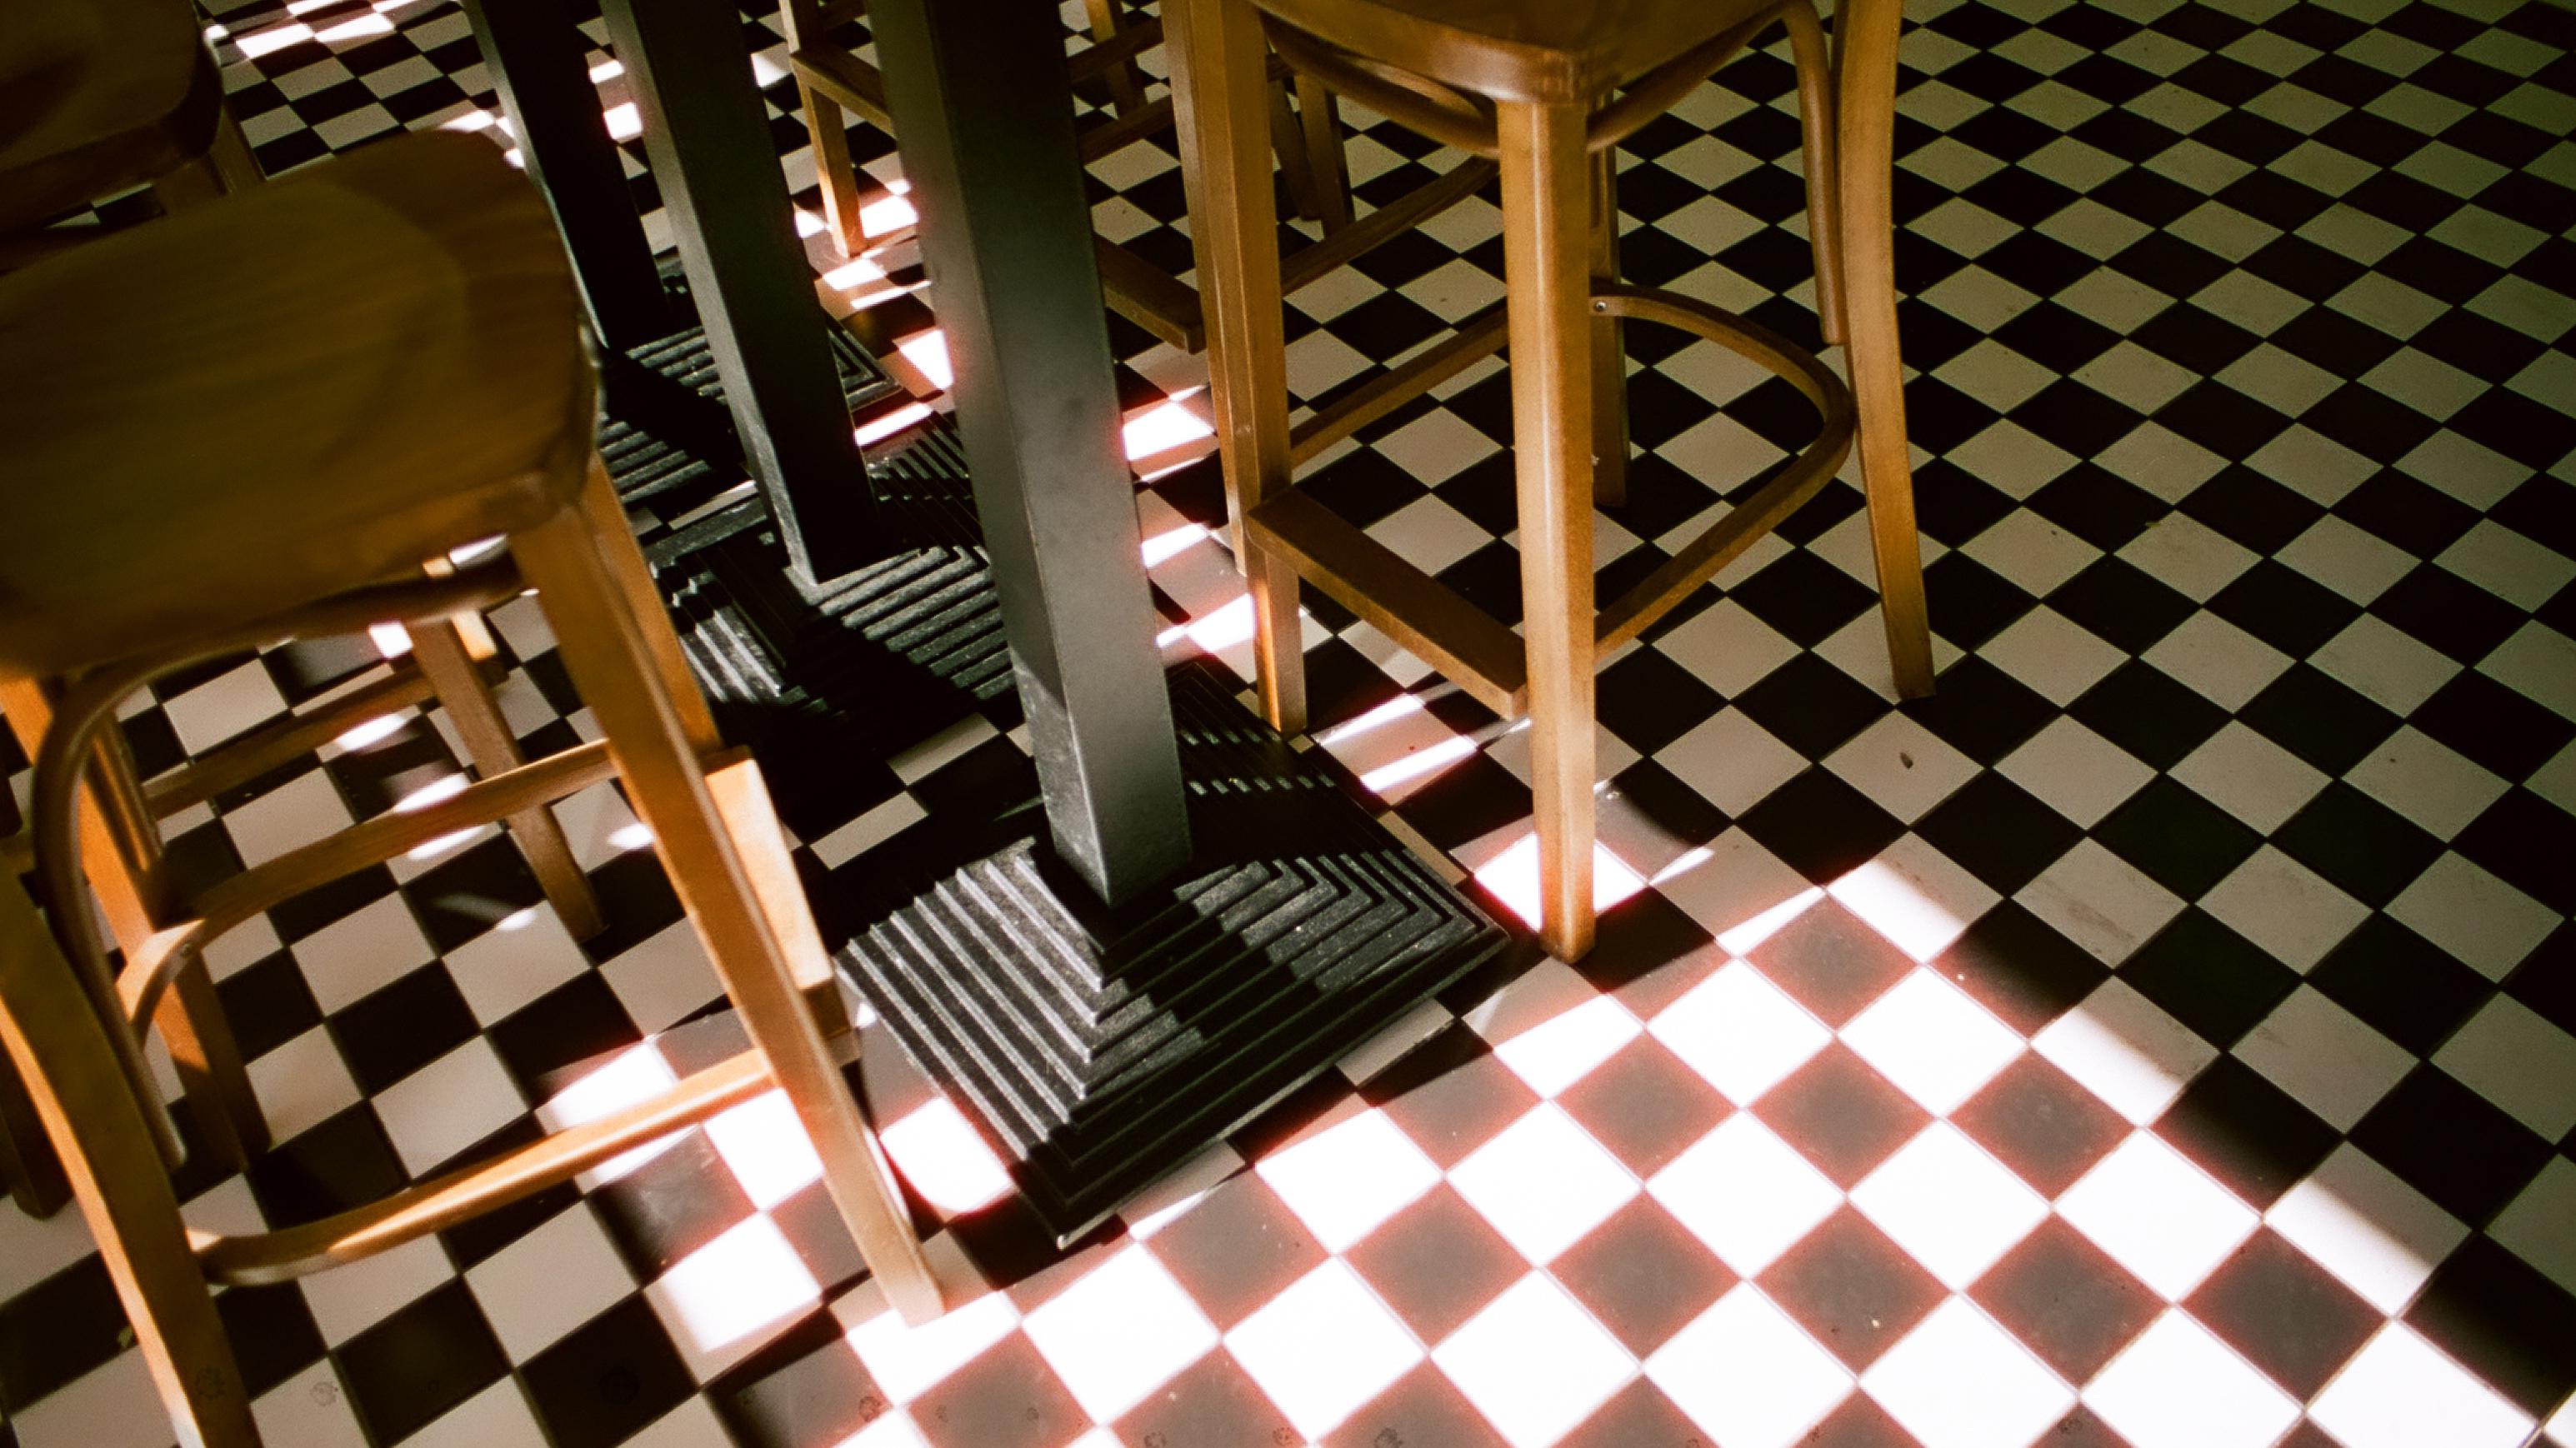 Wallpaper : architecture, symmetry, chair, pattern